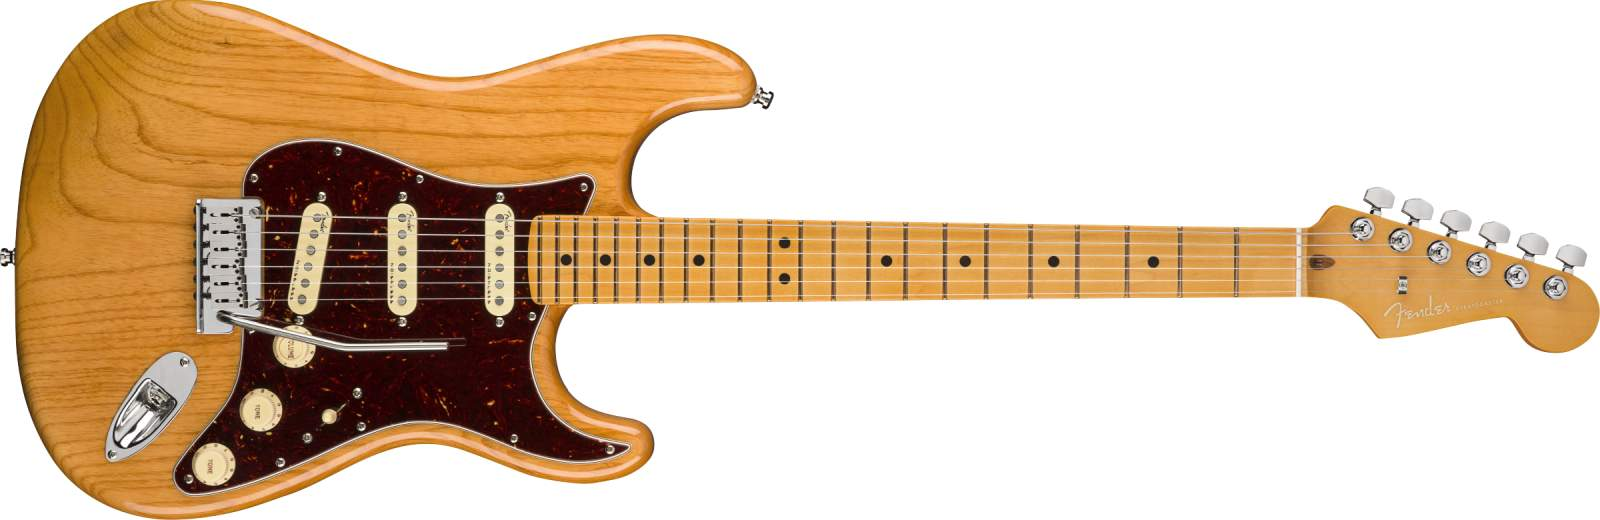 Fender American Ultra Stratocaster MN Natur